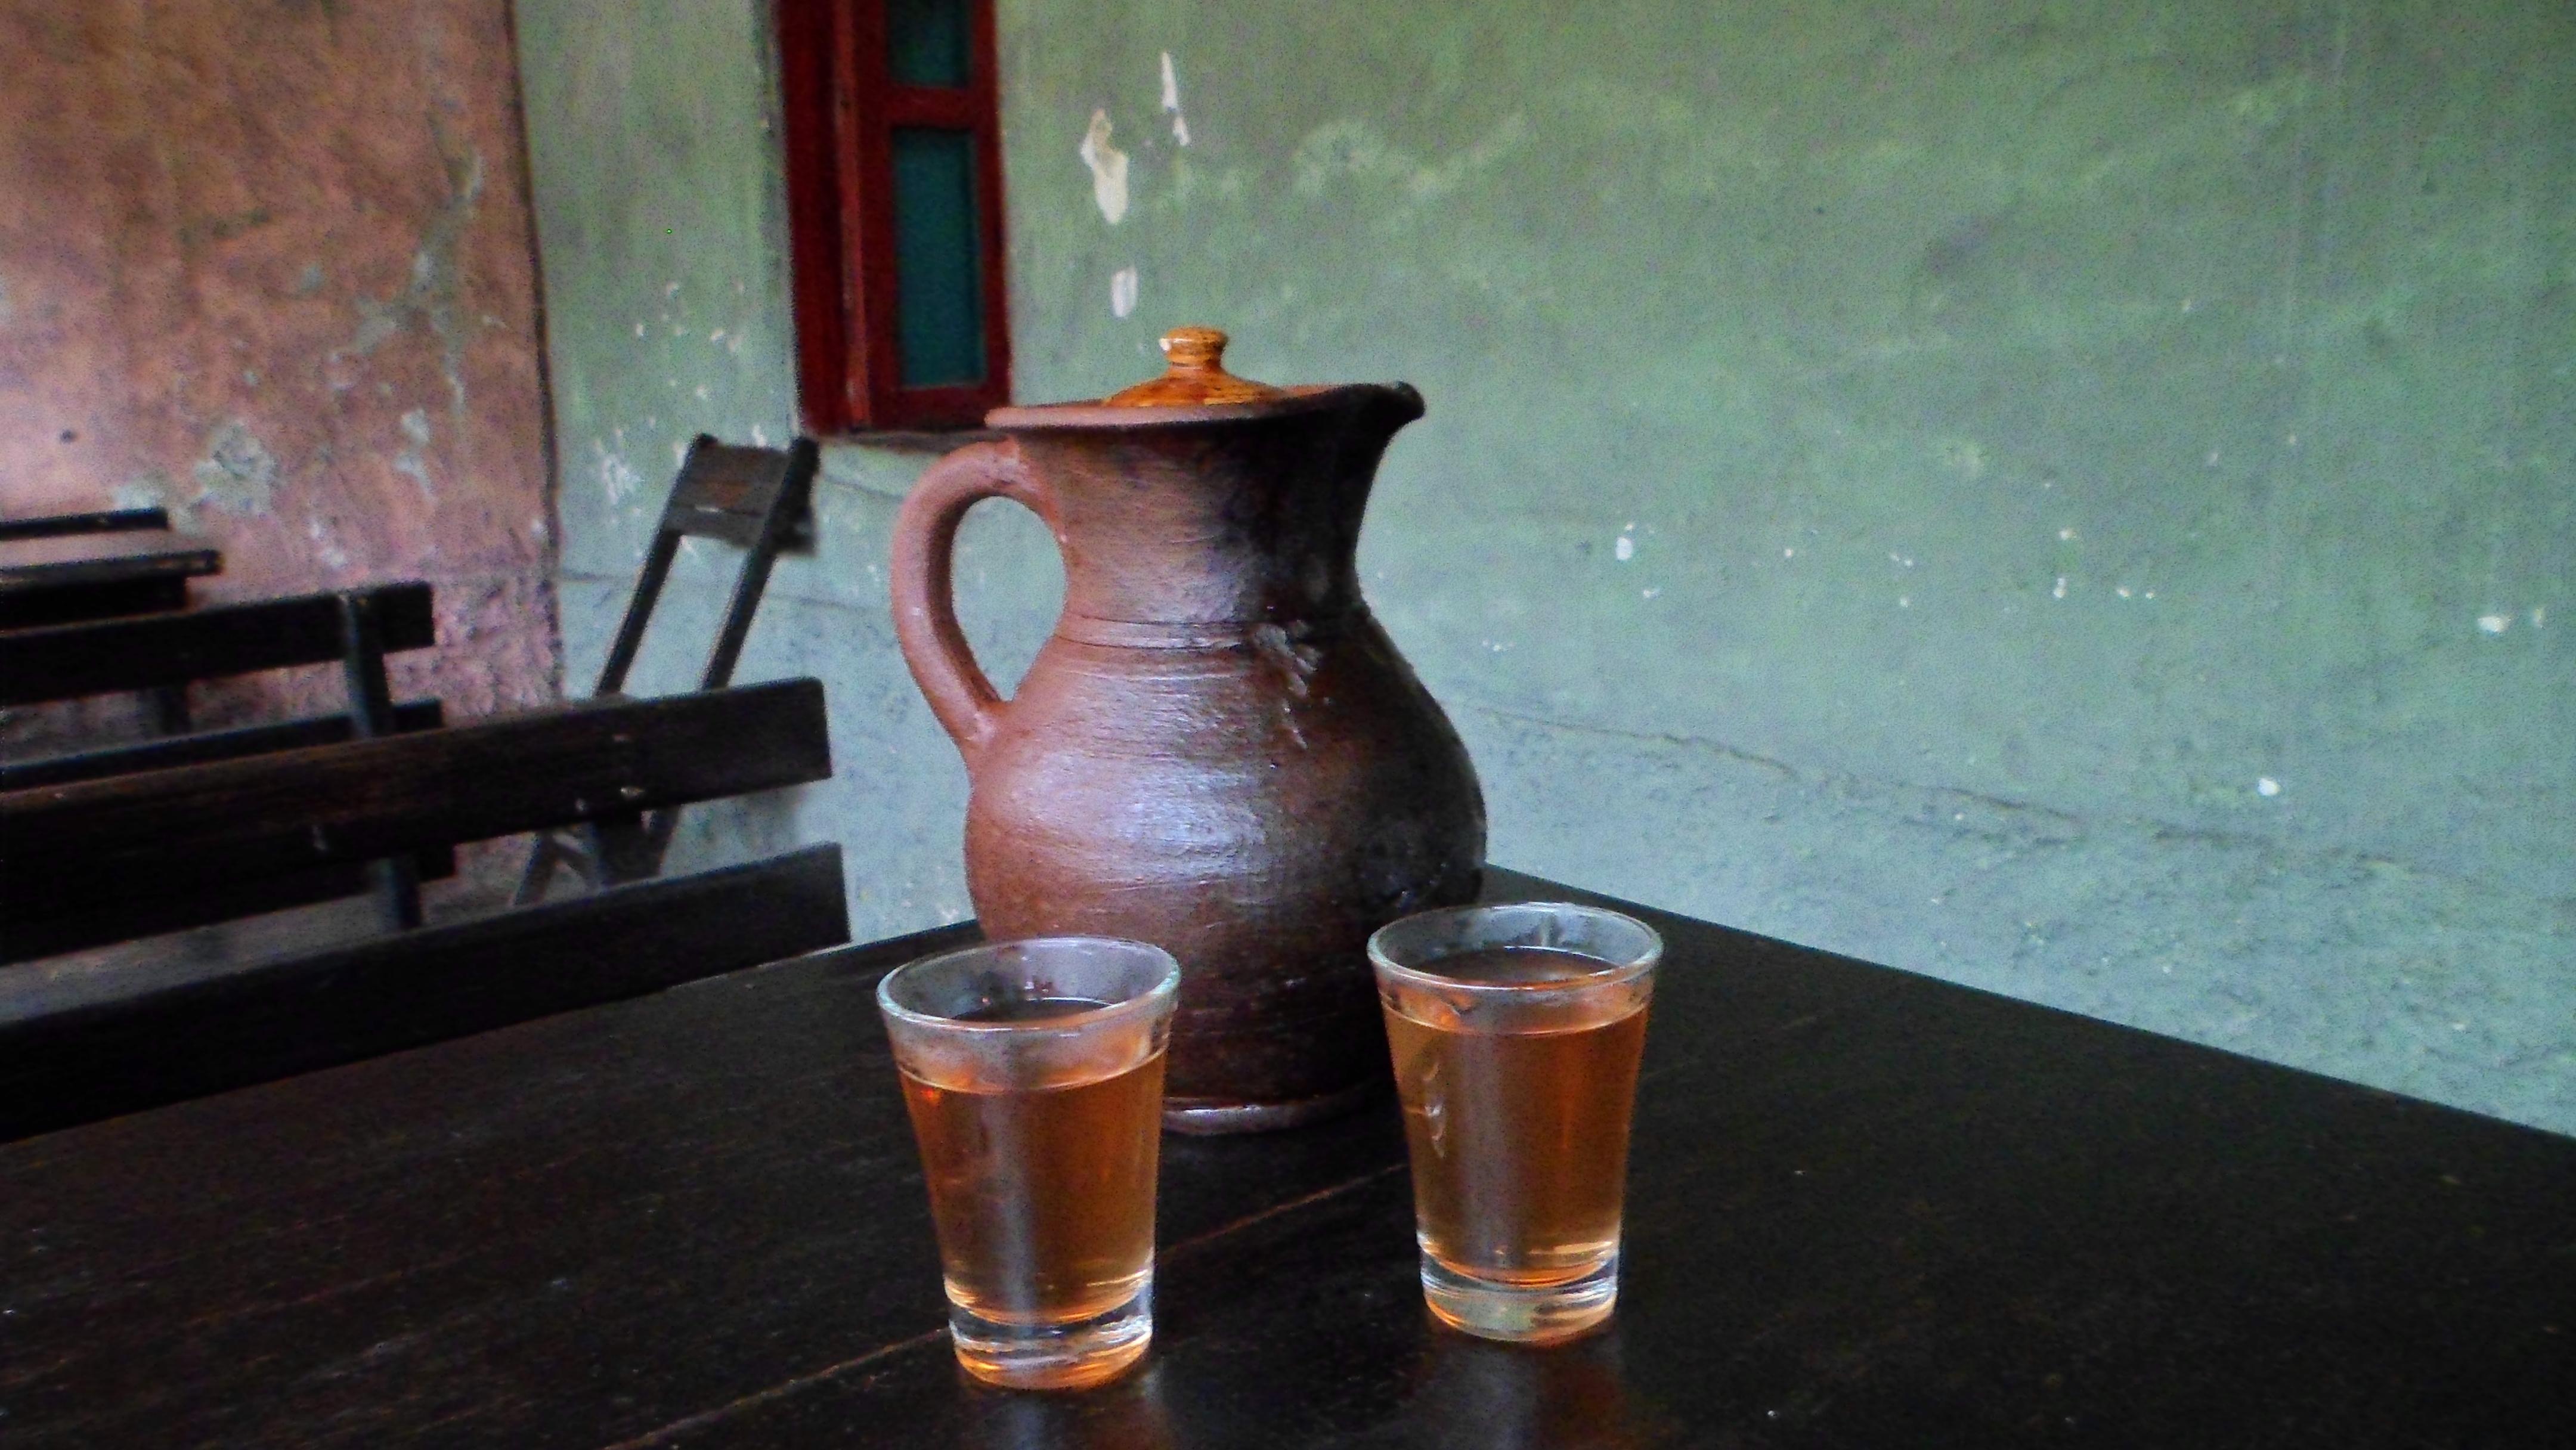 ... hot cup of canelazo canelazo jonny blair drinking canelazo canelazo